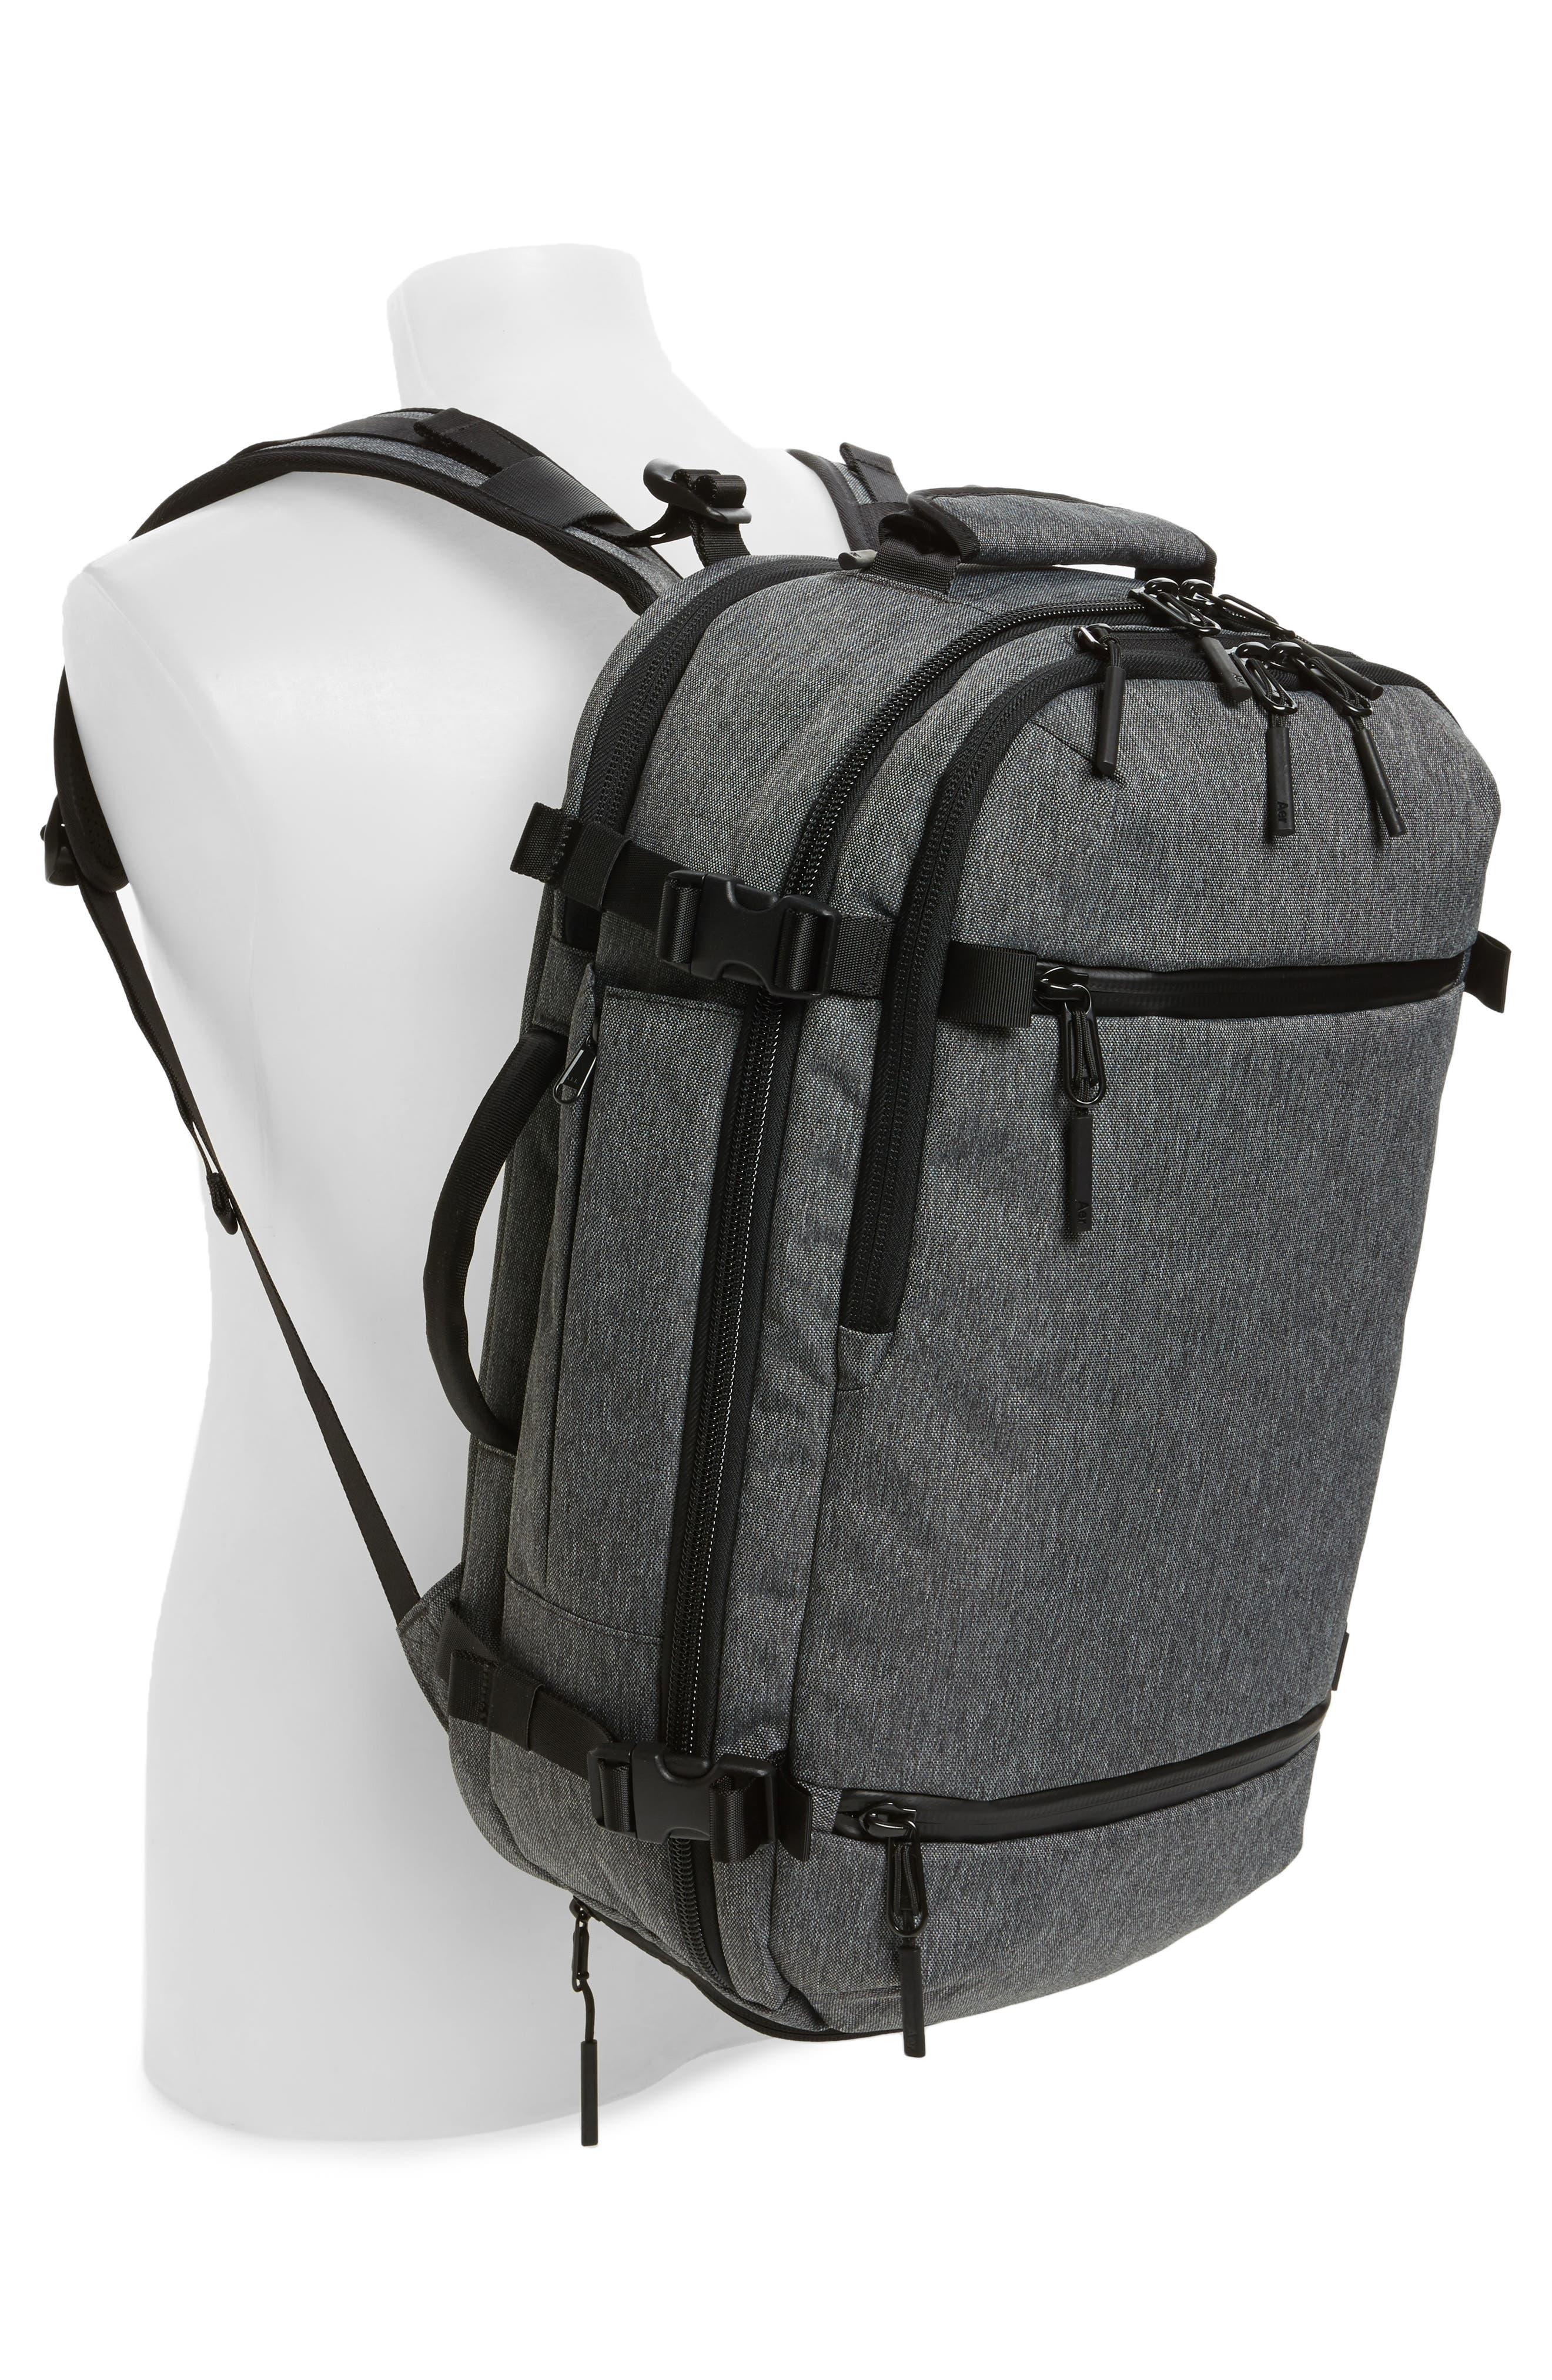 Travel Pack Backpack,                             Alternate thumbnail 2, color,                             GREY